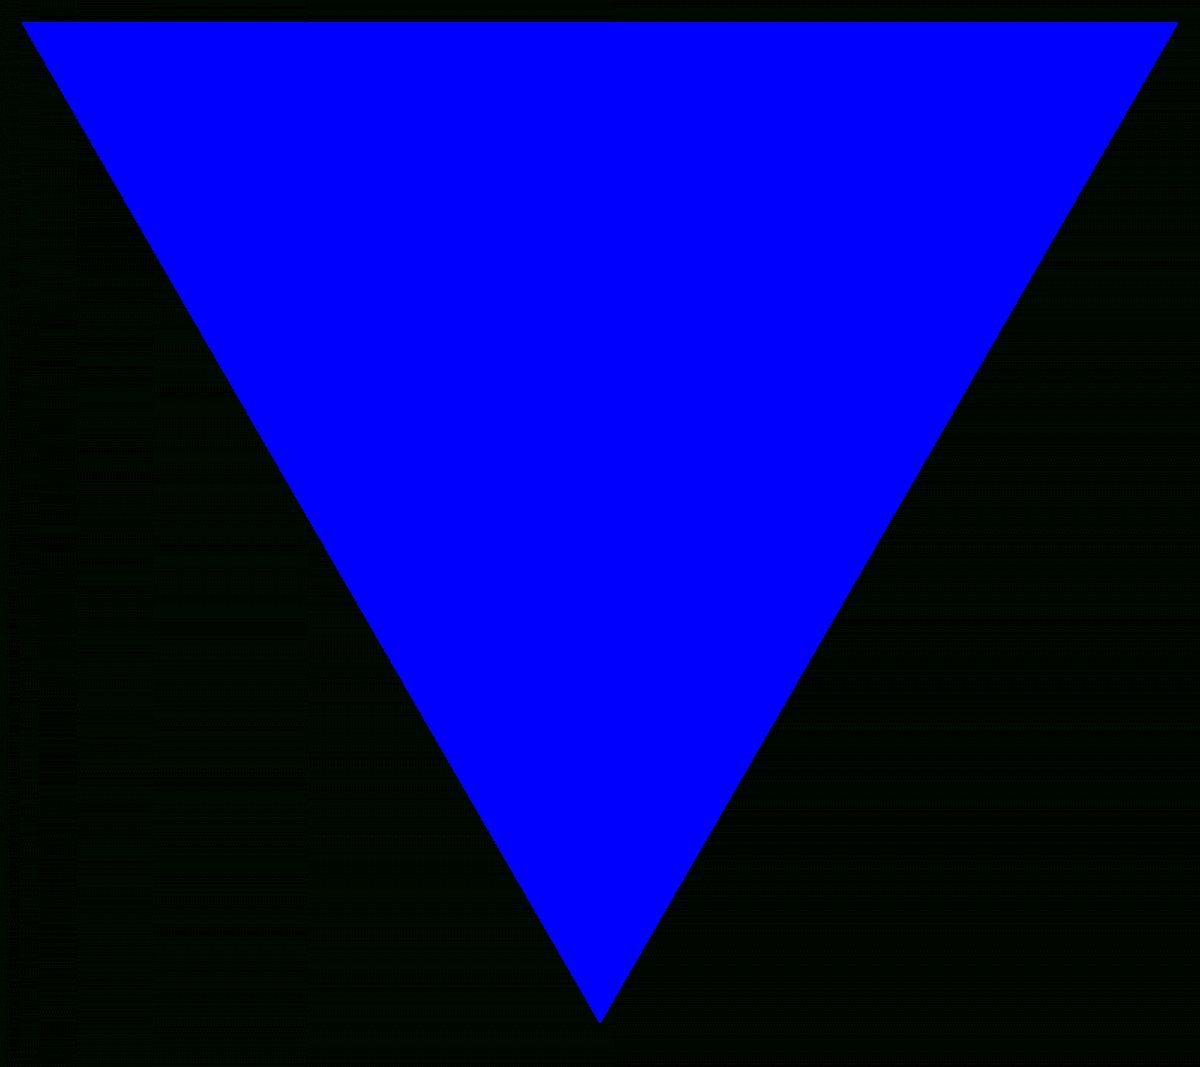 10 Blue Triangle Png Geometric Triangles Art Triangle Background Triangle